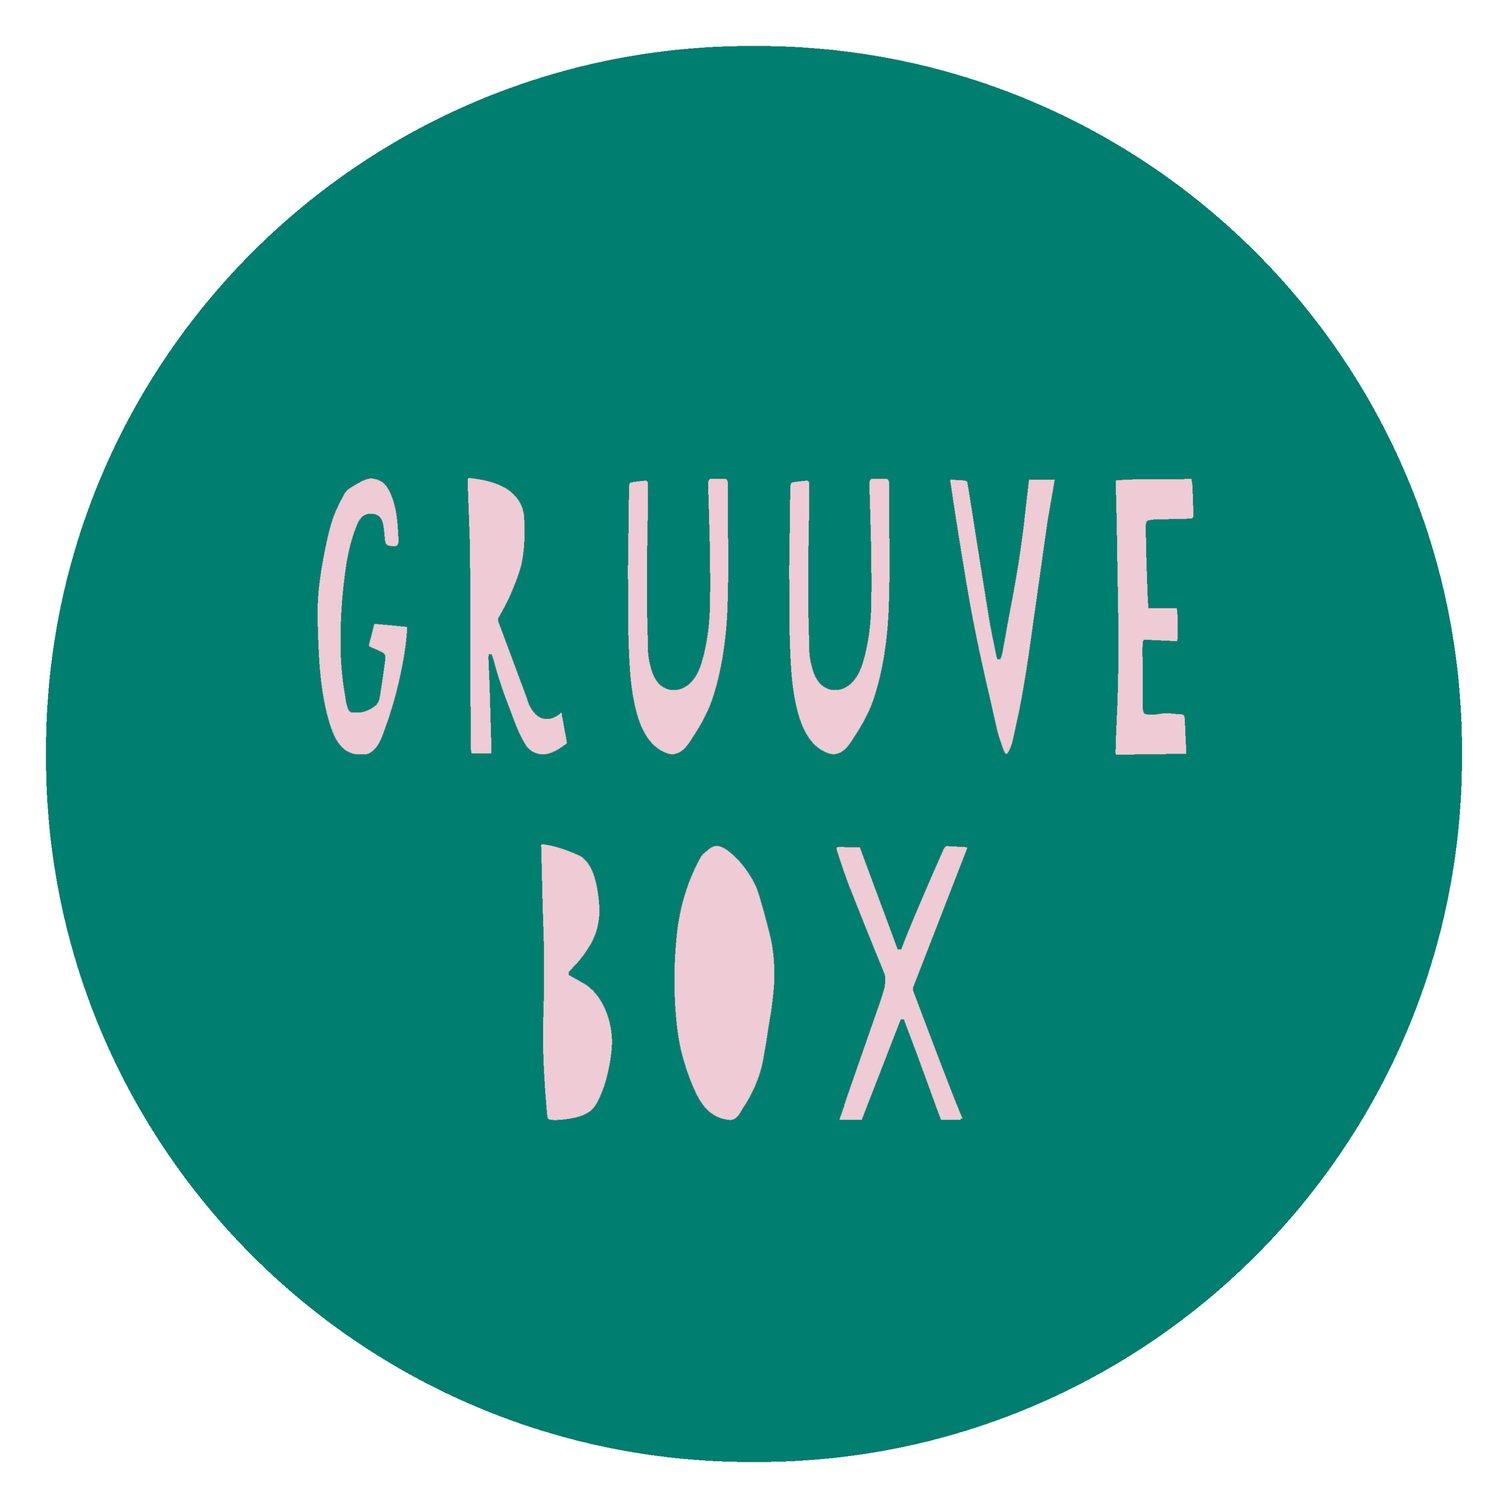 GRUUVE BOX Home